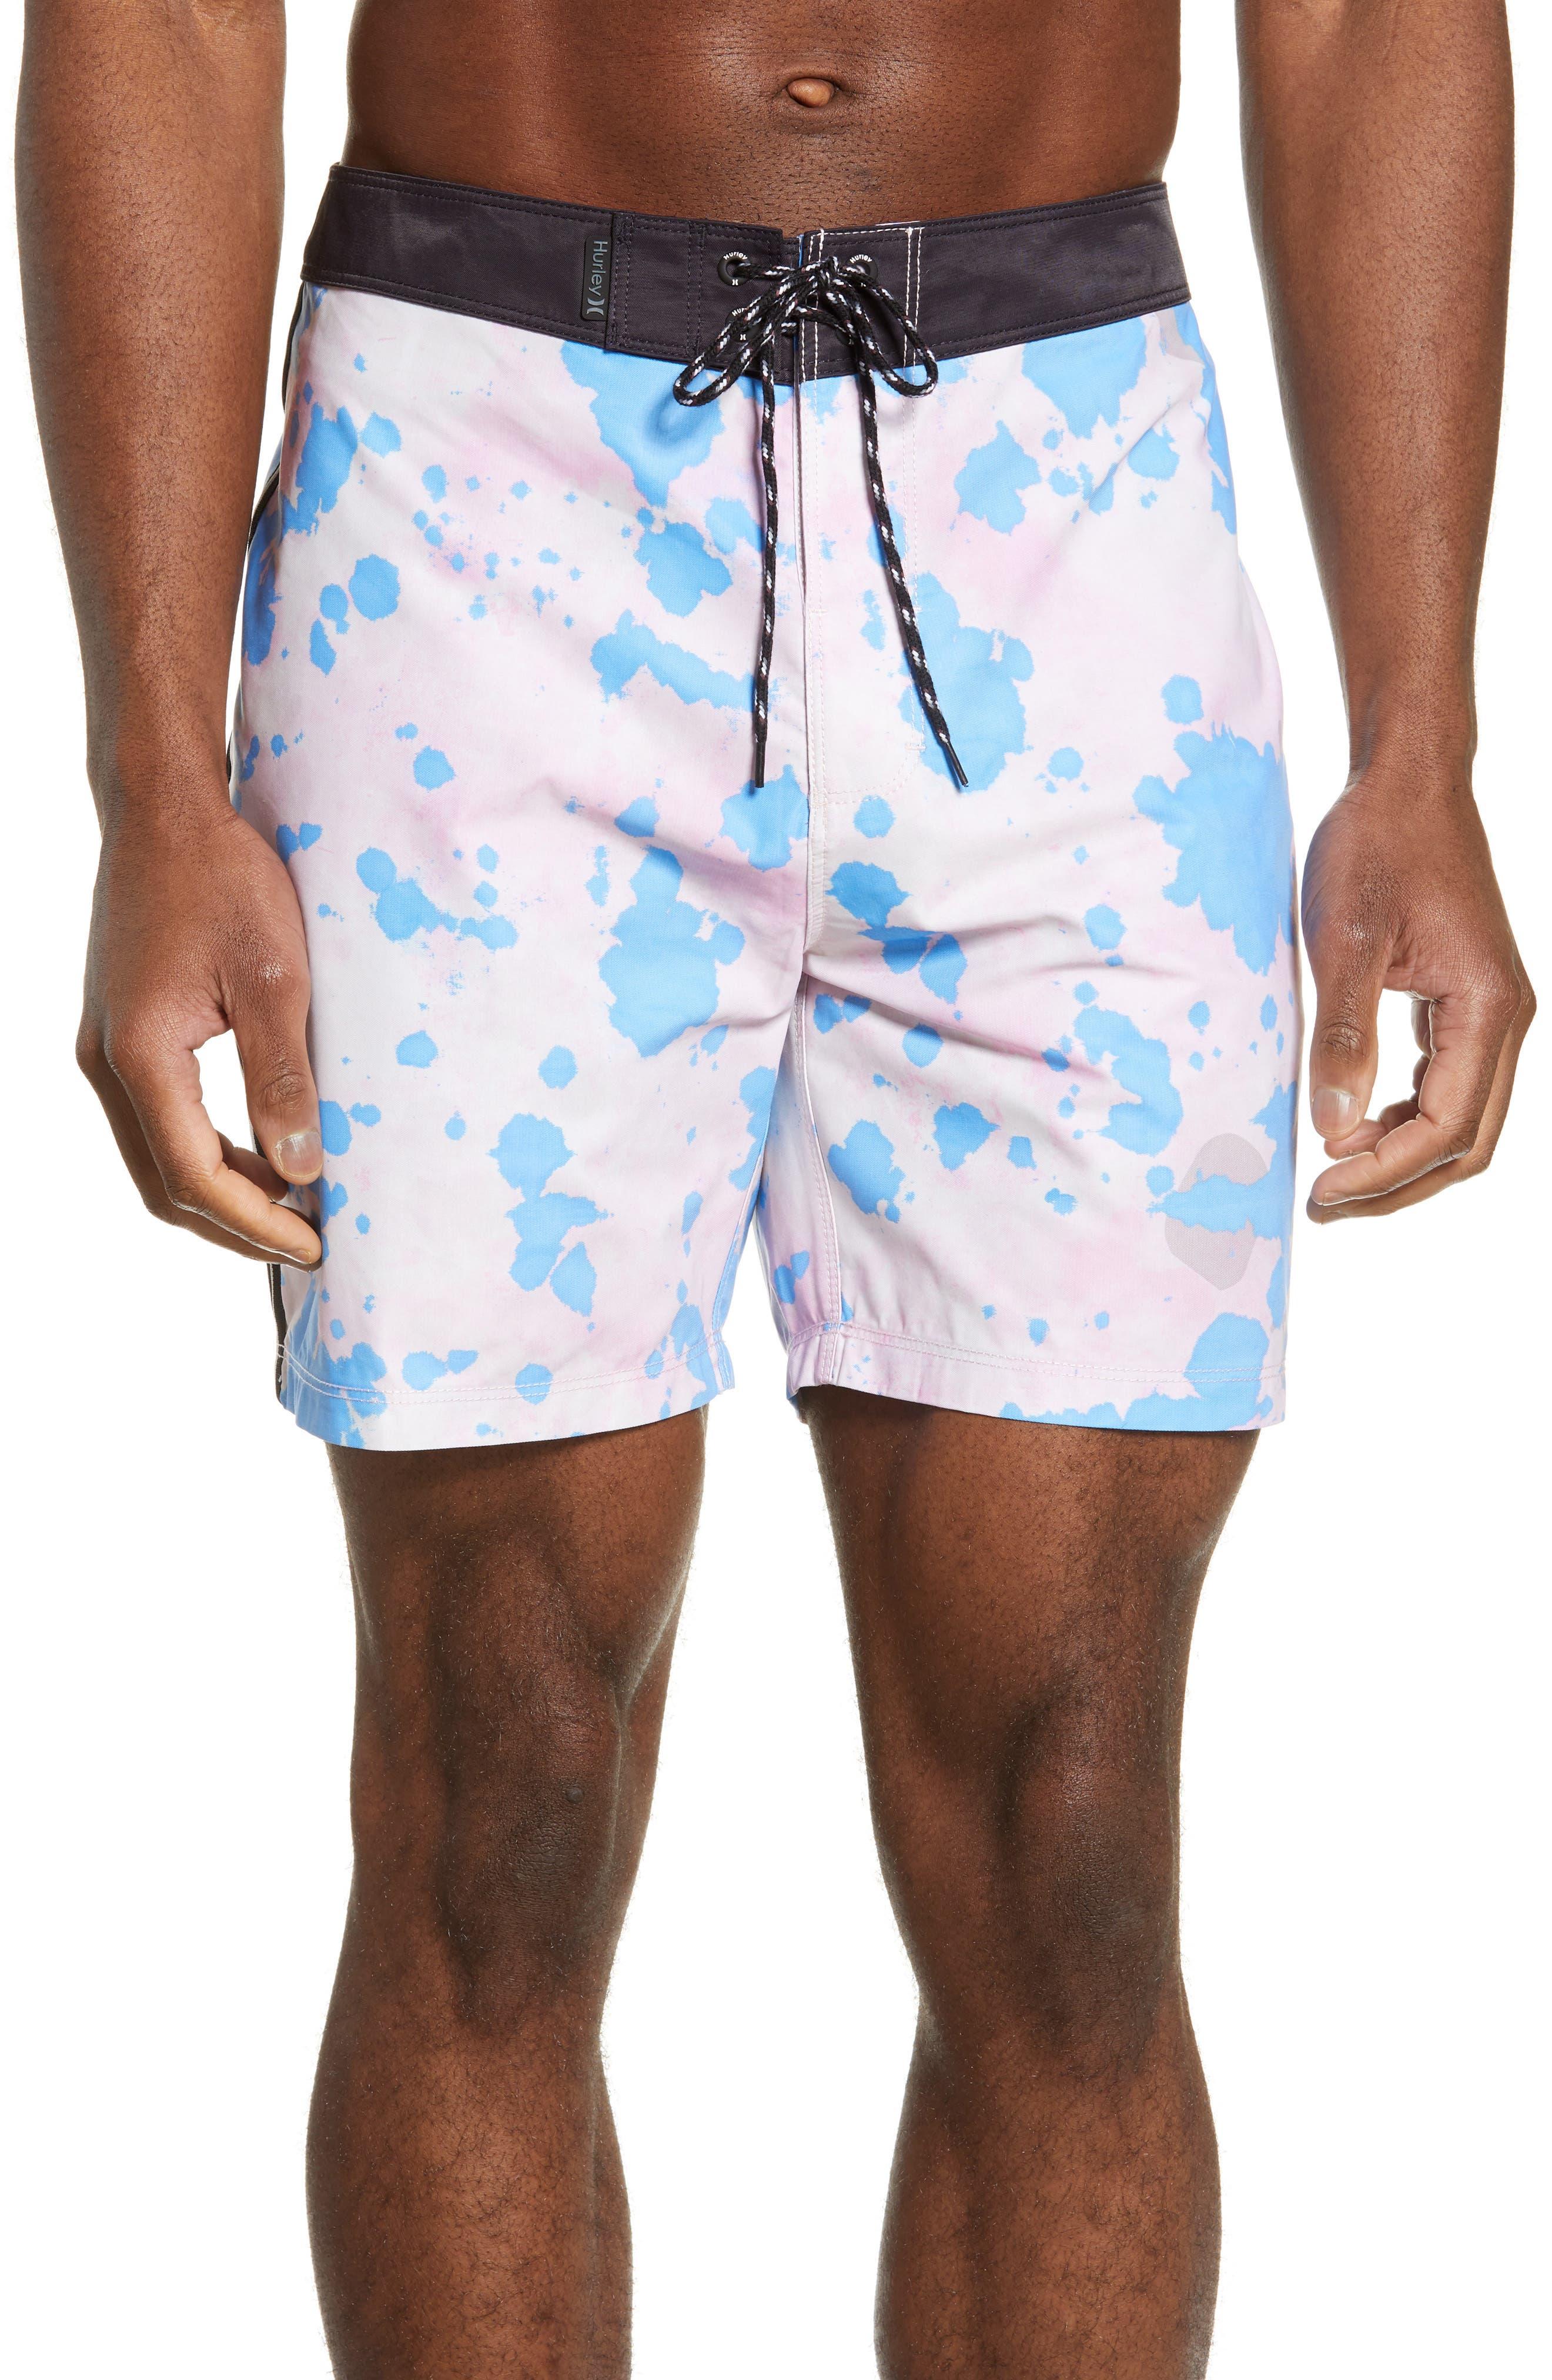 Hurley Phantom Bleach Daze Board Shorts, Pink